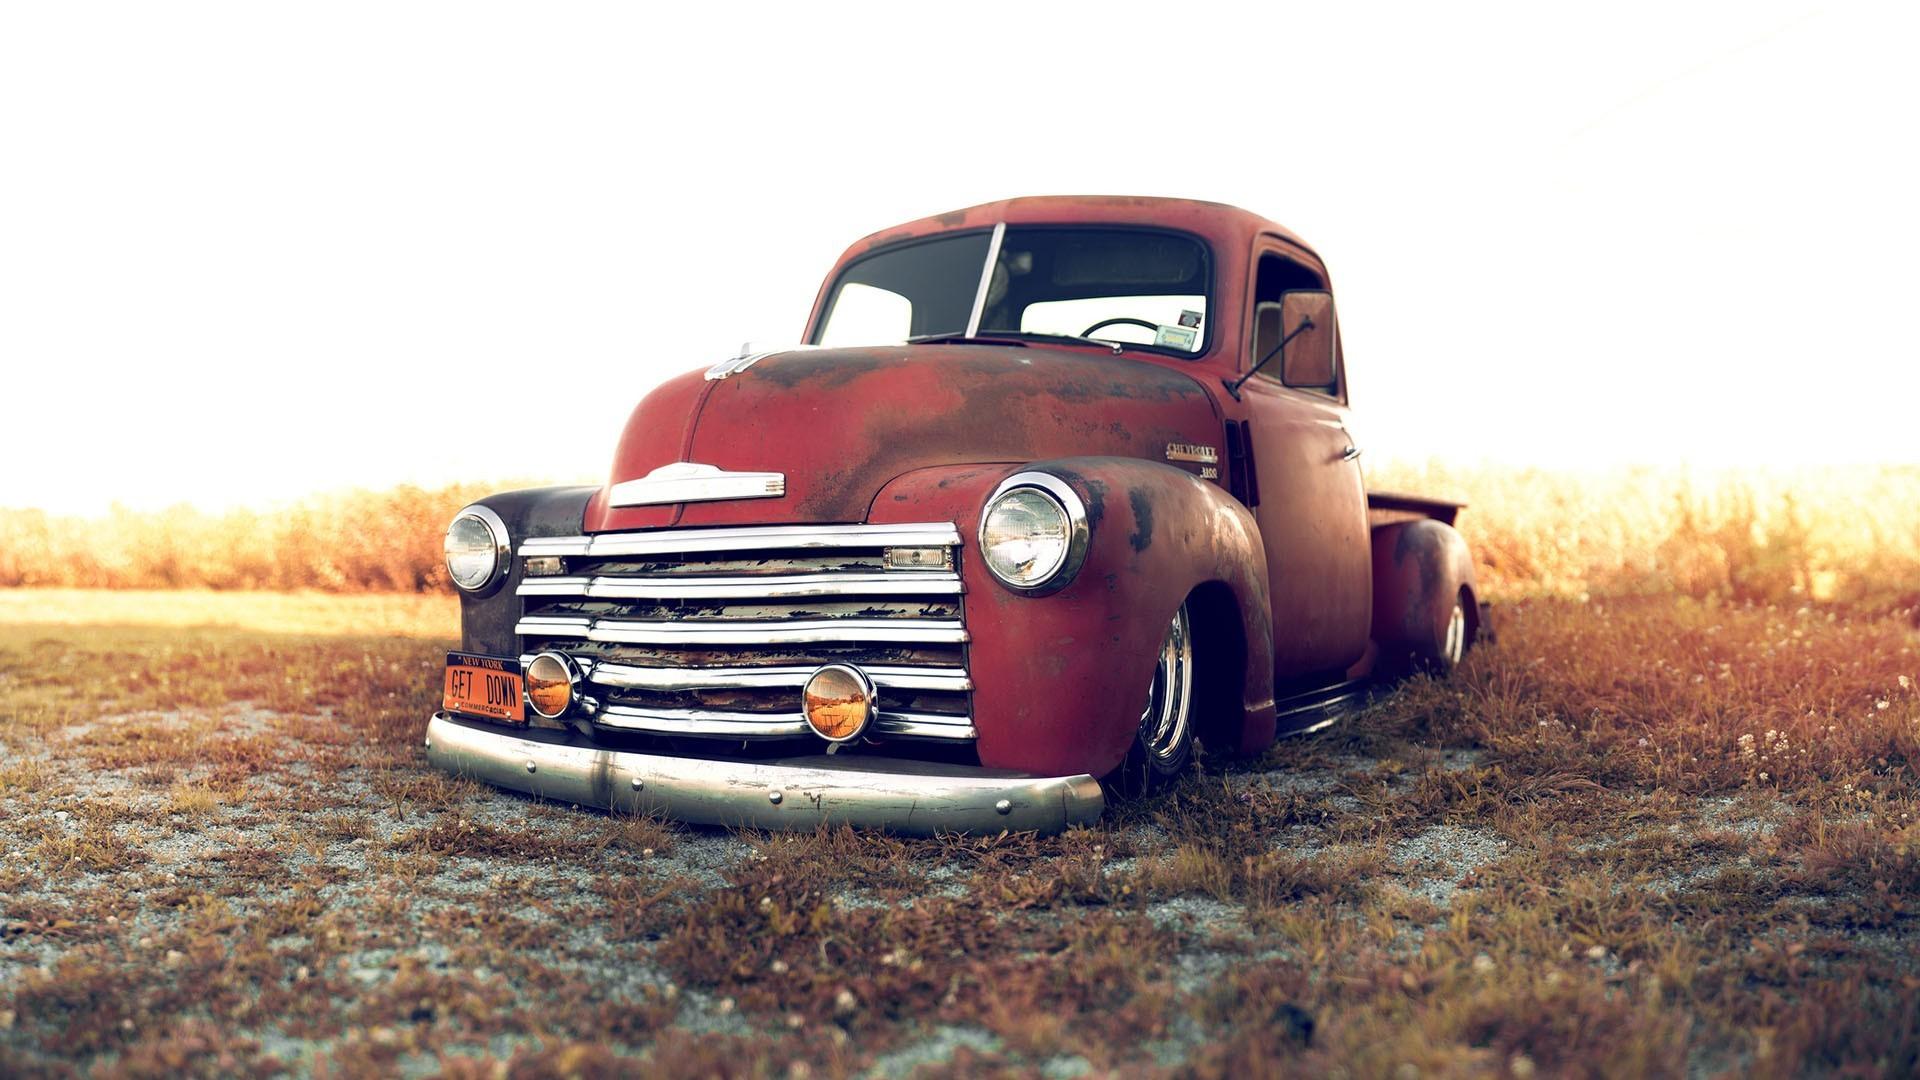 1949 CHEVY chevrolet trucks lowriders custom classic-cars wallpaper .